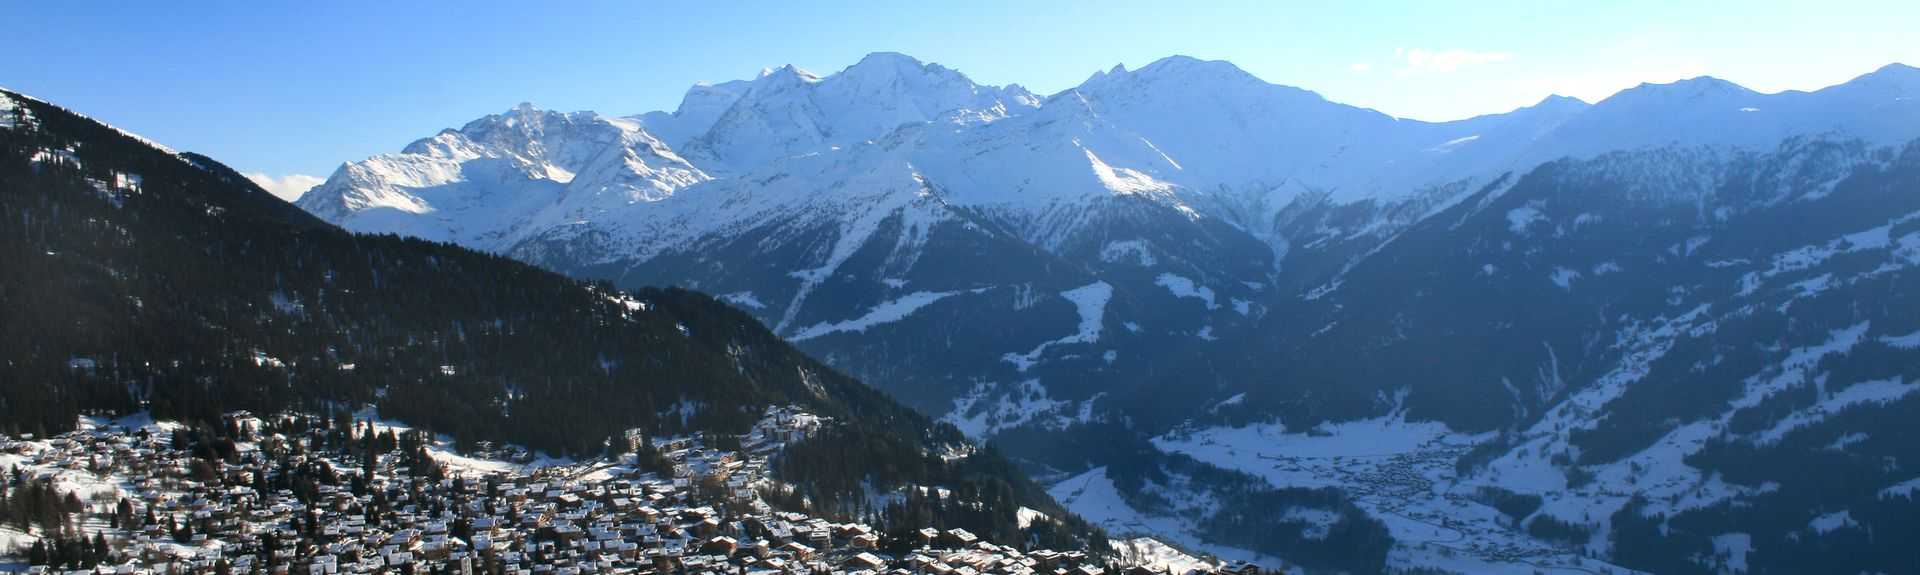 Verbier, Bagnes, Valais, Switzerland